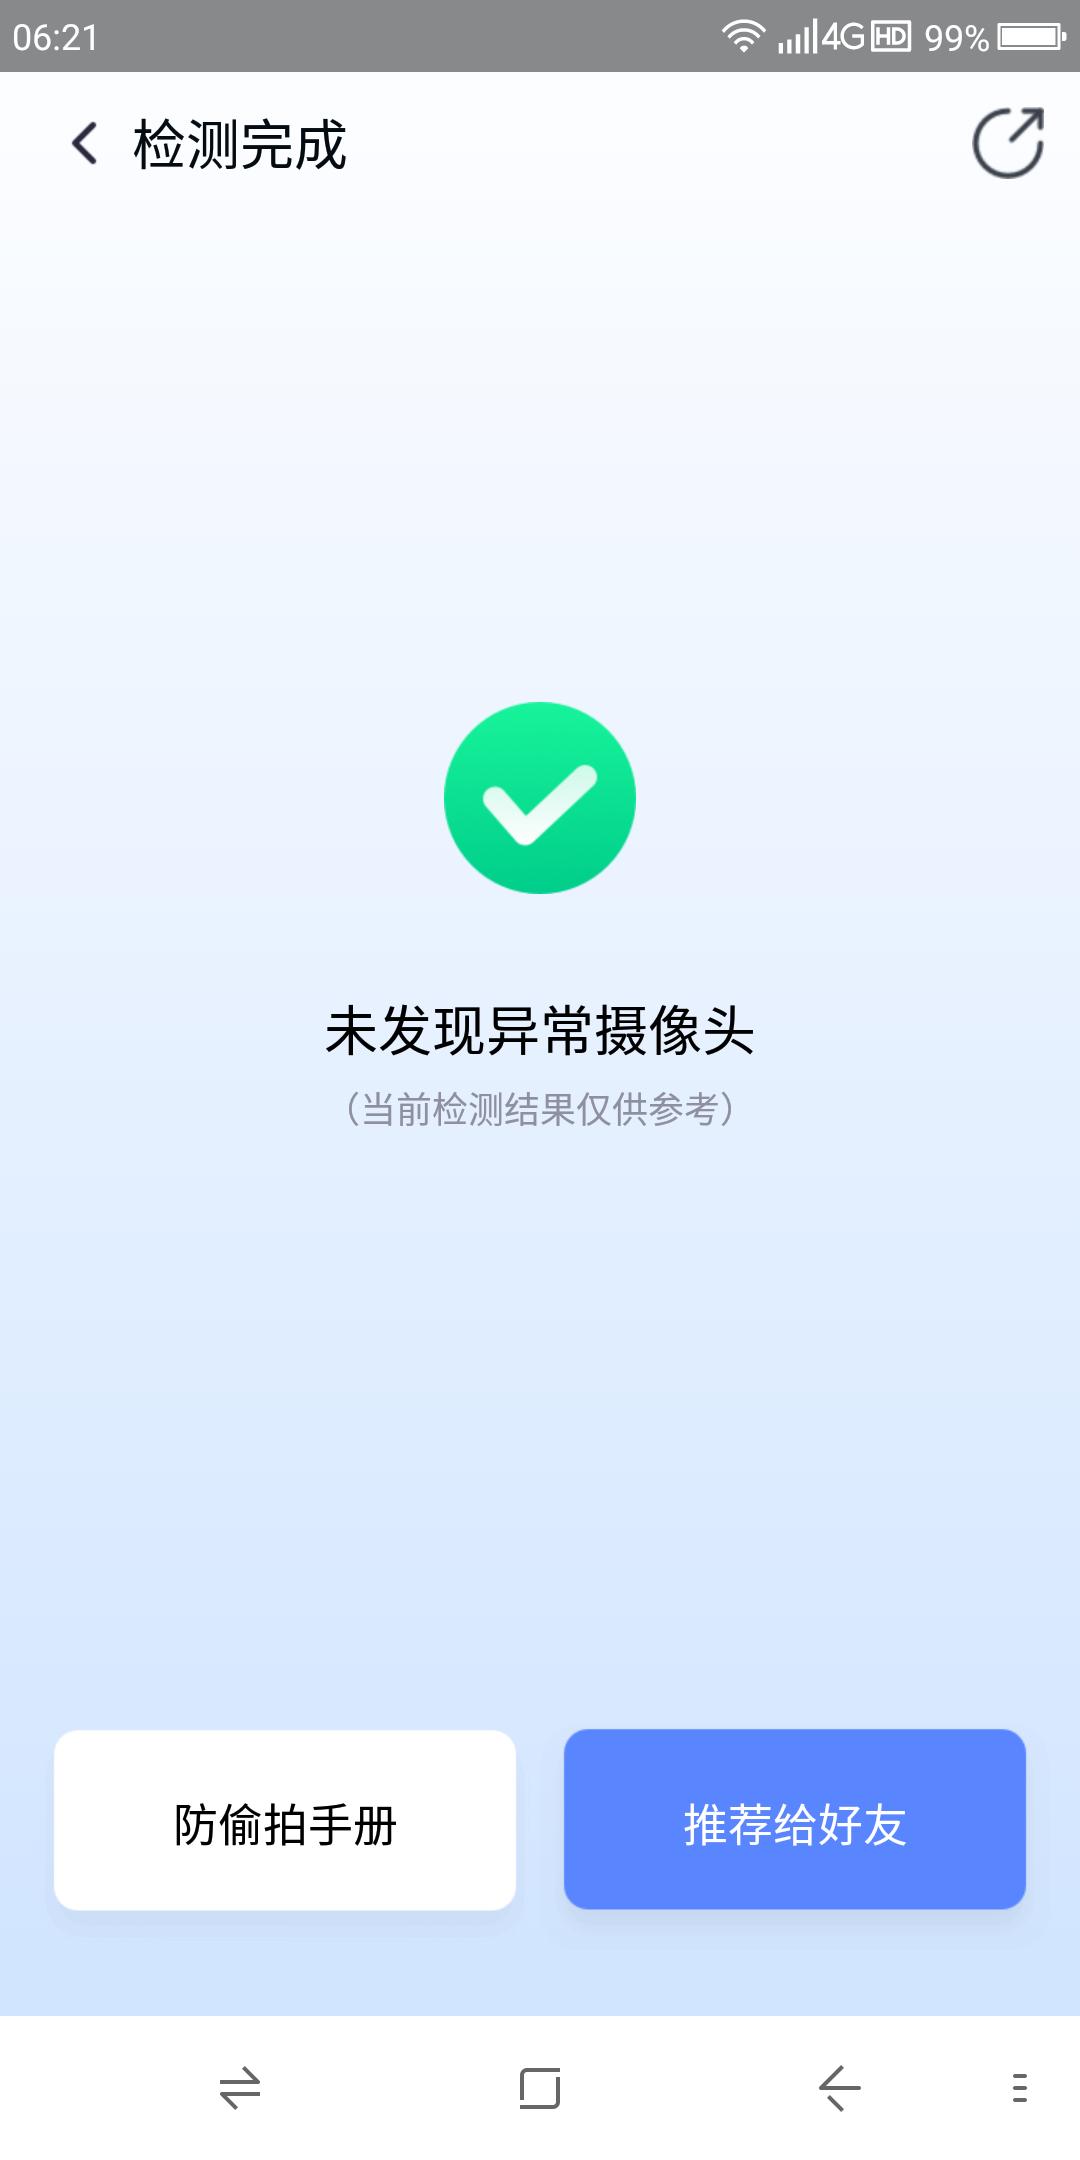 Screenshot_2020-01-22-06-21-25.png